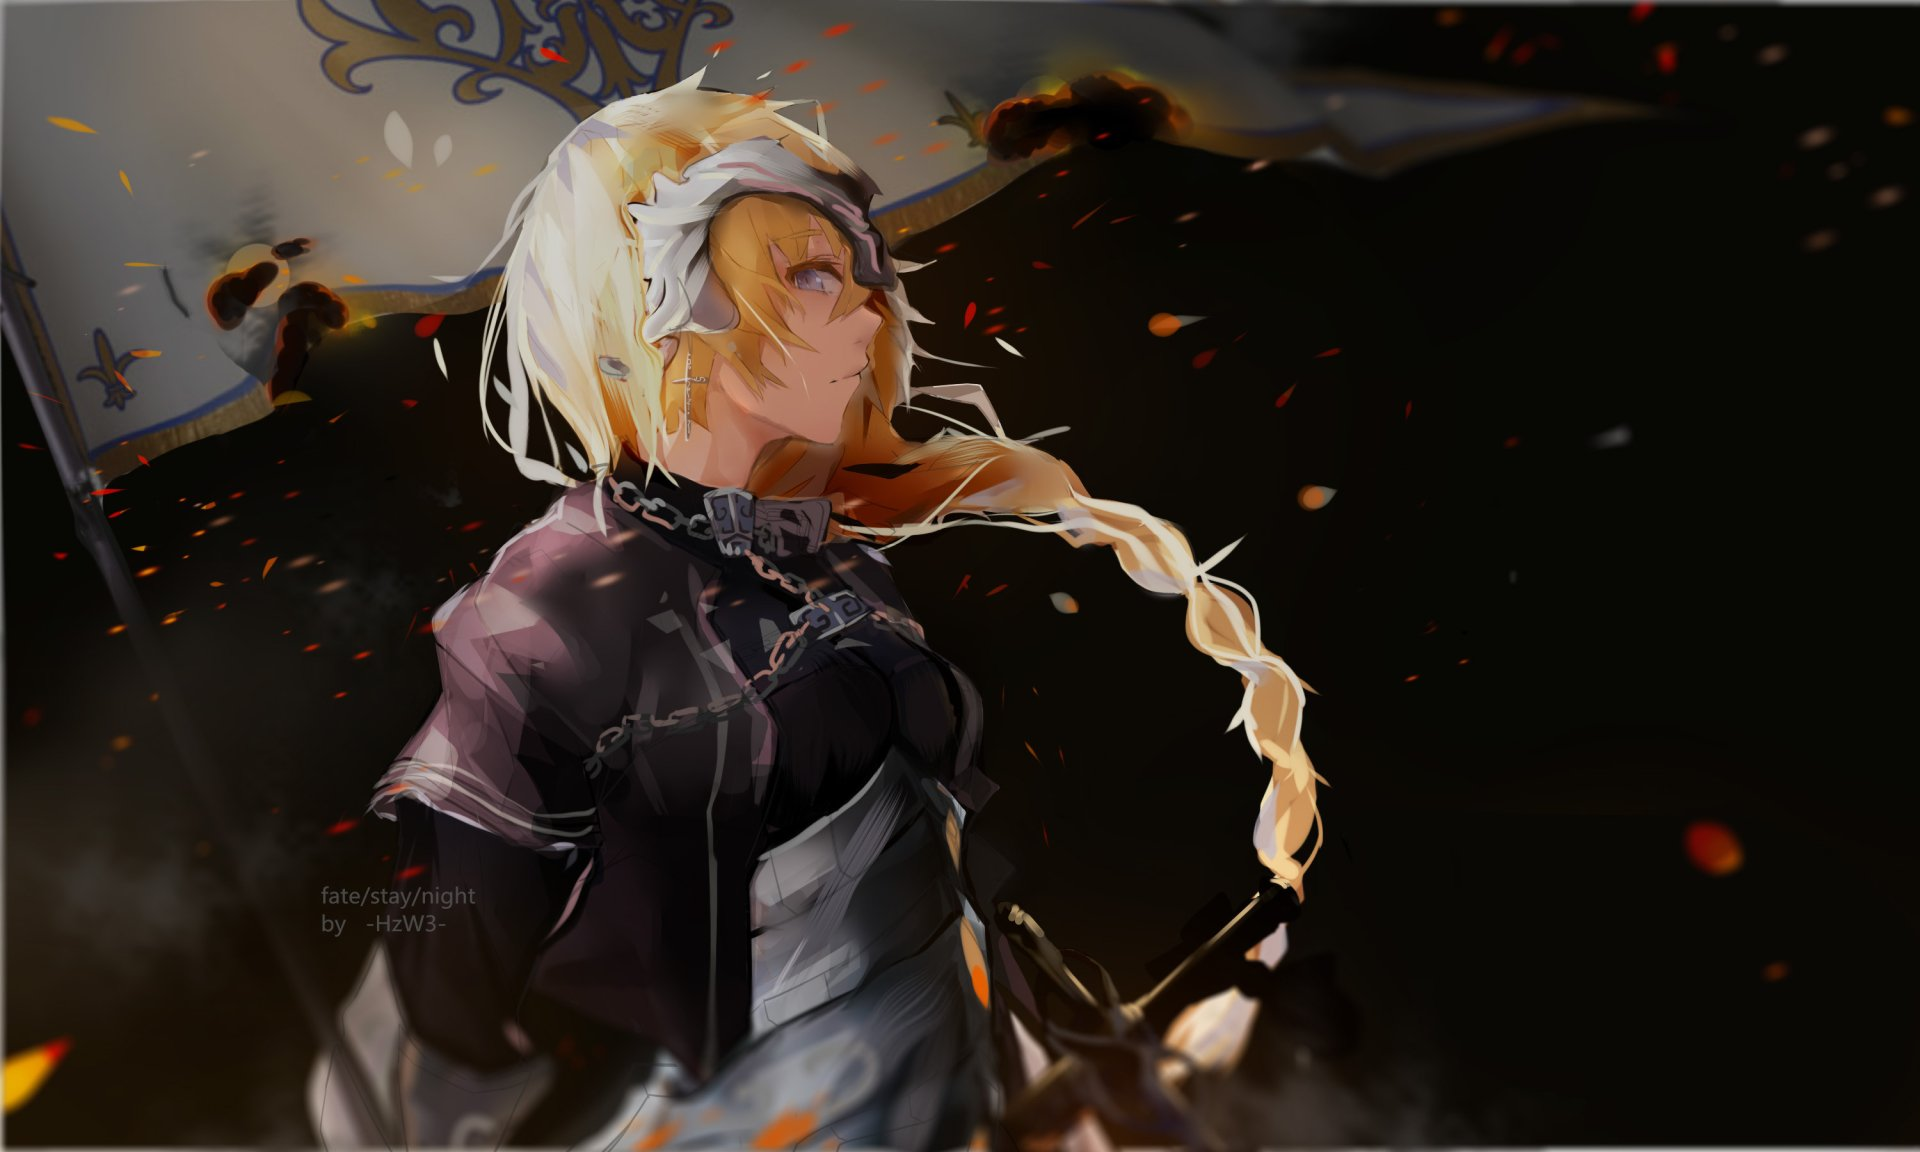 Anime - Fate/Apocrypha  Jeanne d'Arc Girl Braid Blonde Blue Eyes Woman Warrior Wallpaper